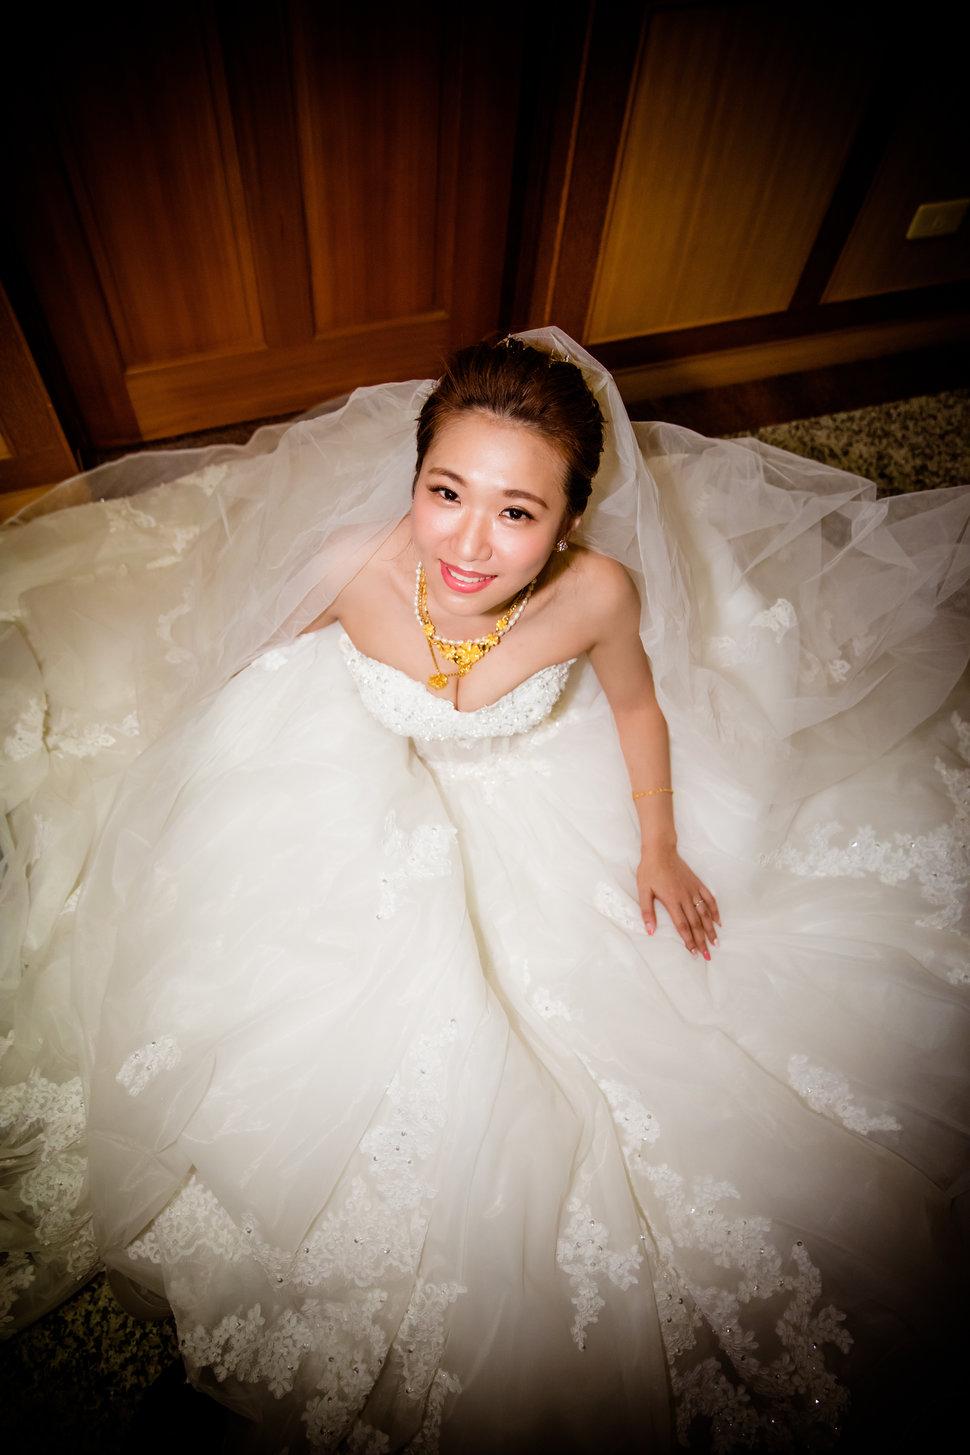 5D4_7444 - Promaker婚禮紀錄攝影團隊婚攝豪哥《結婚吧》